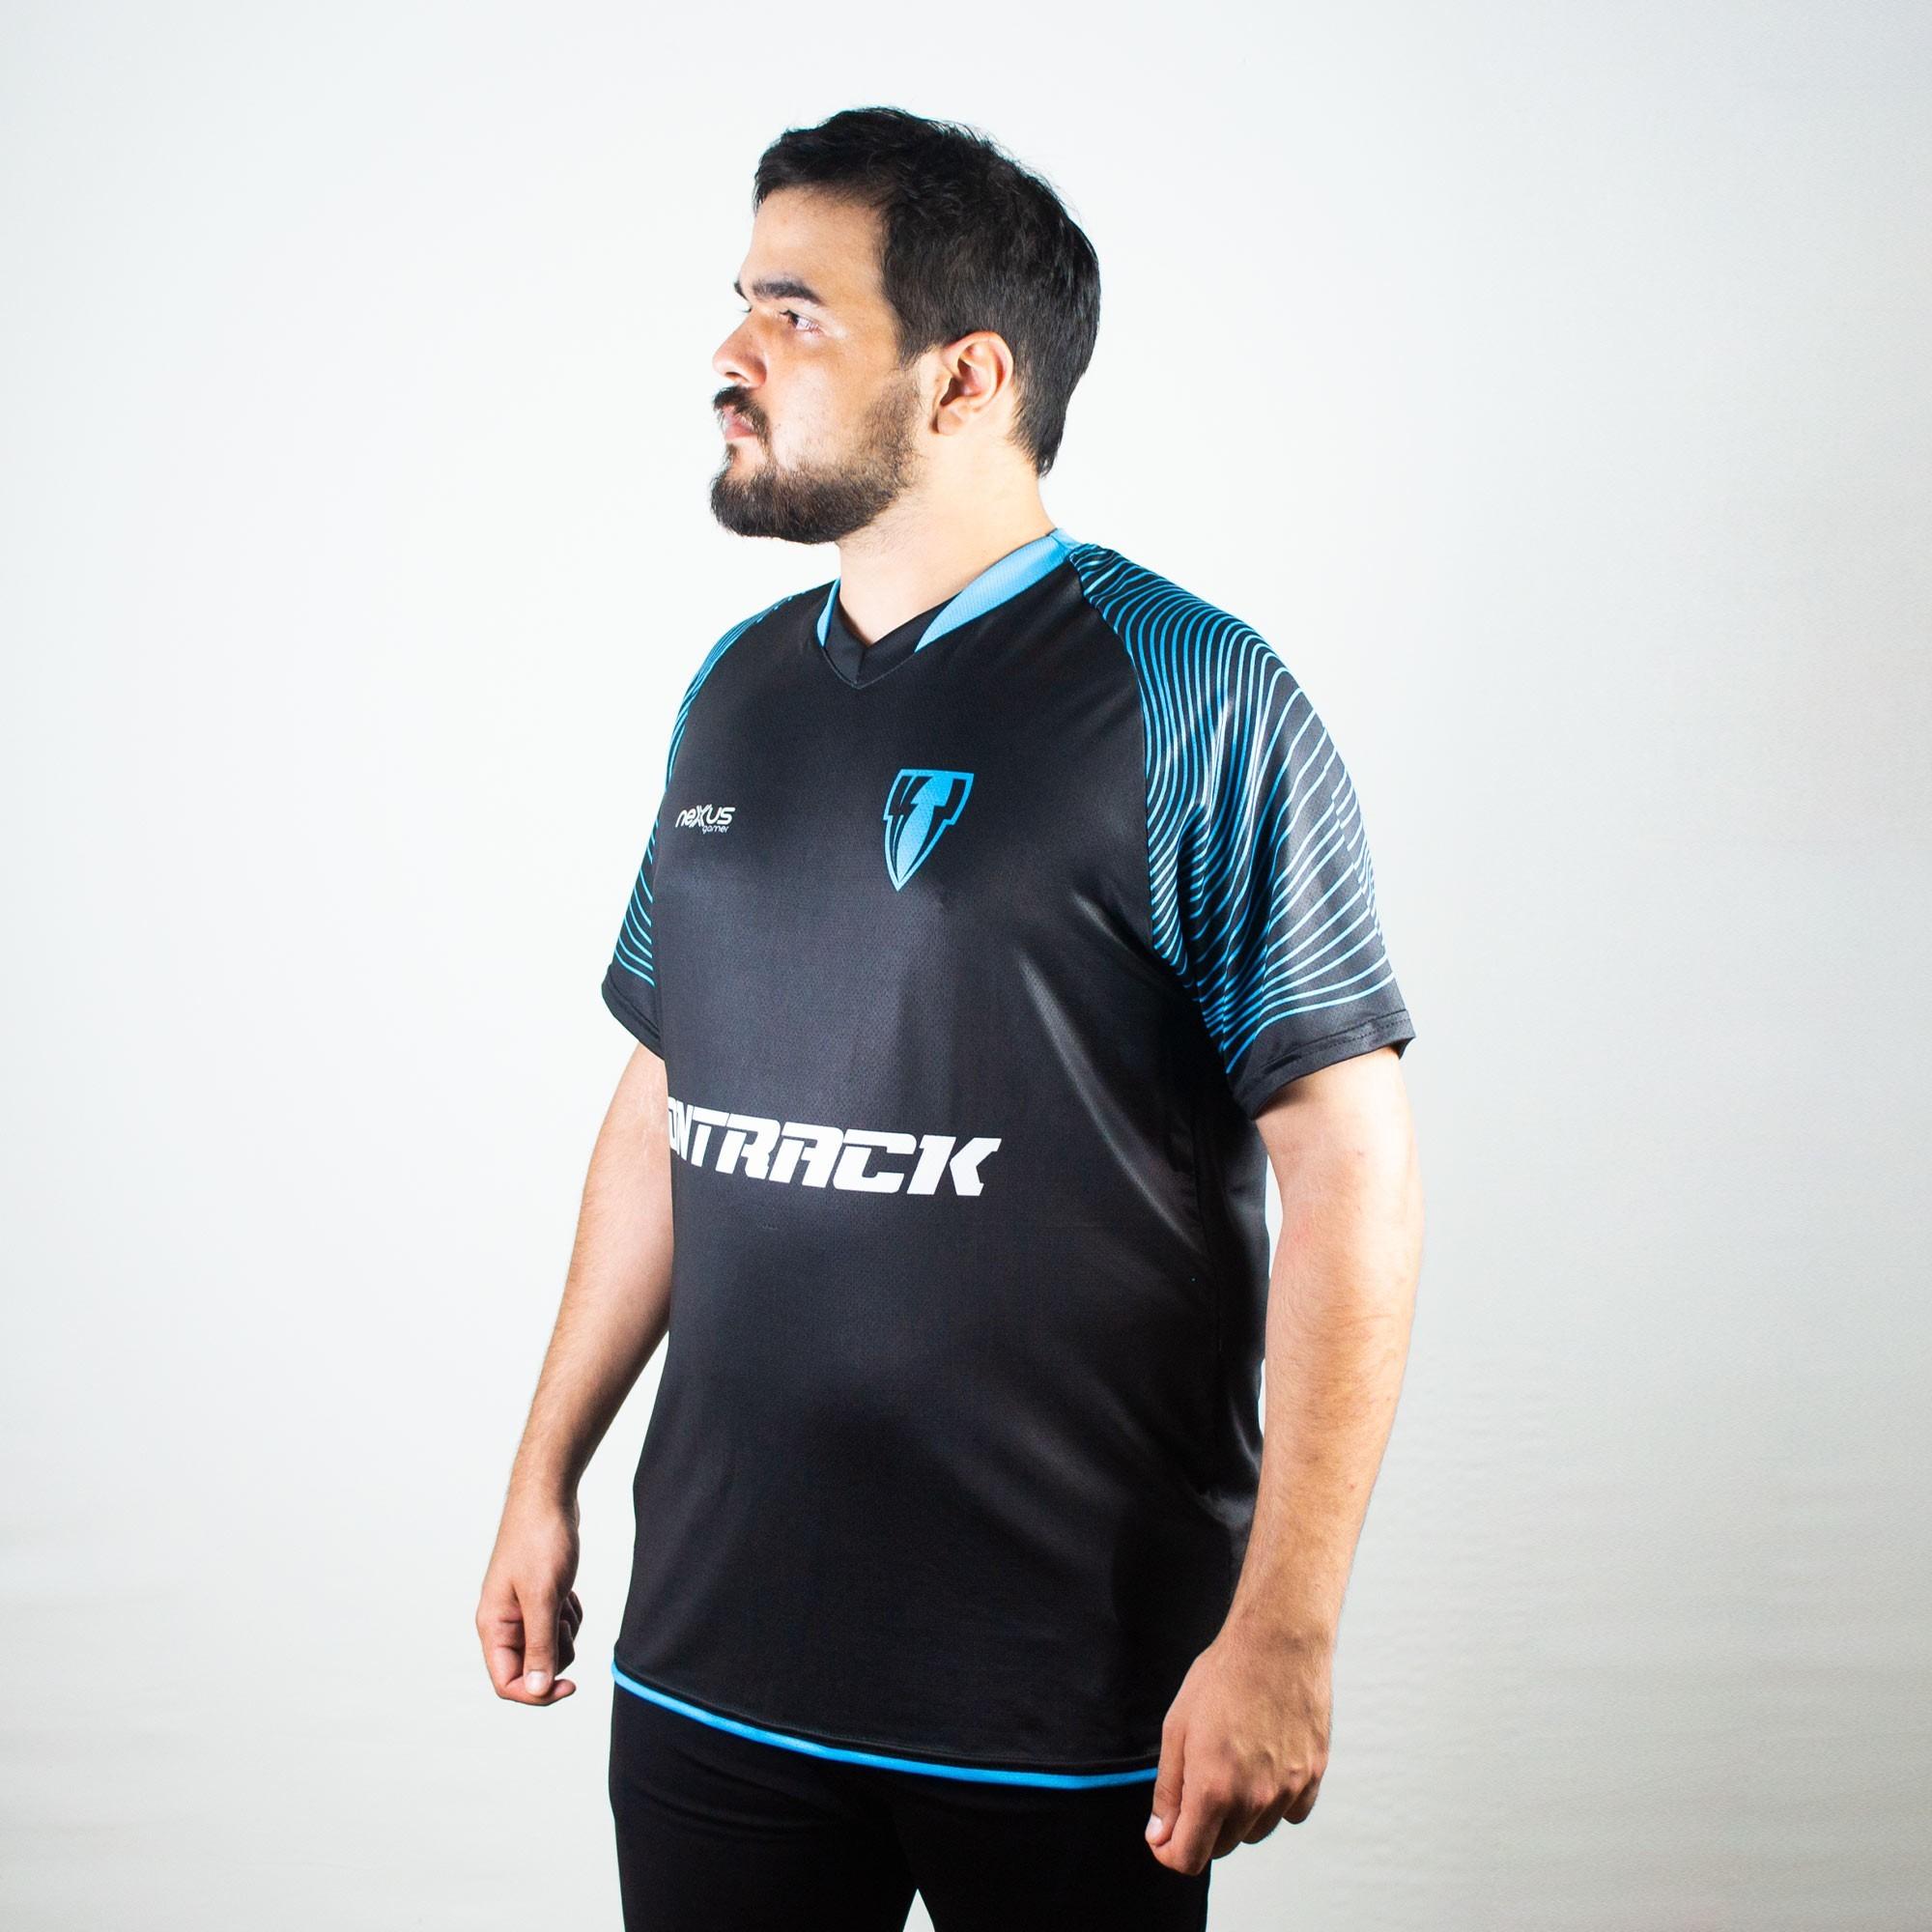 Camiseta Jersey Vincit Gaming Oficial